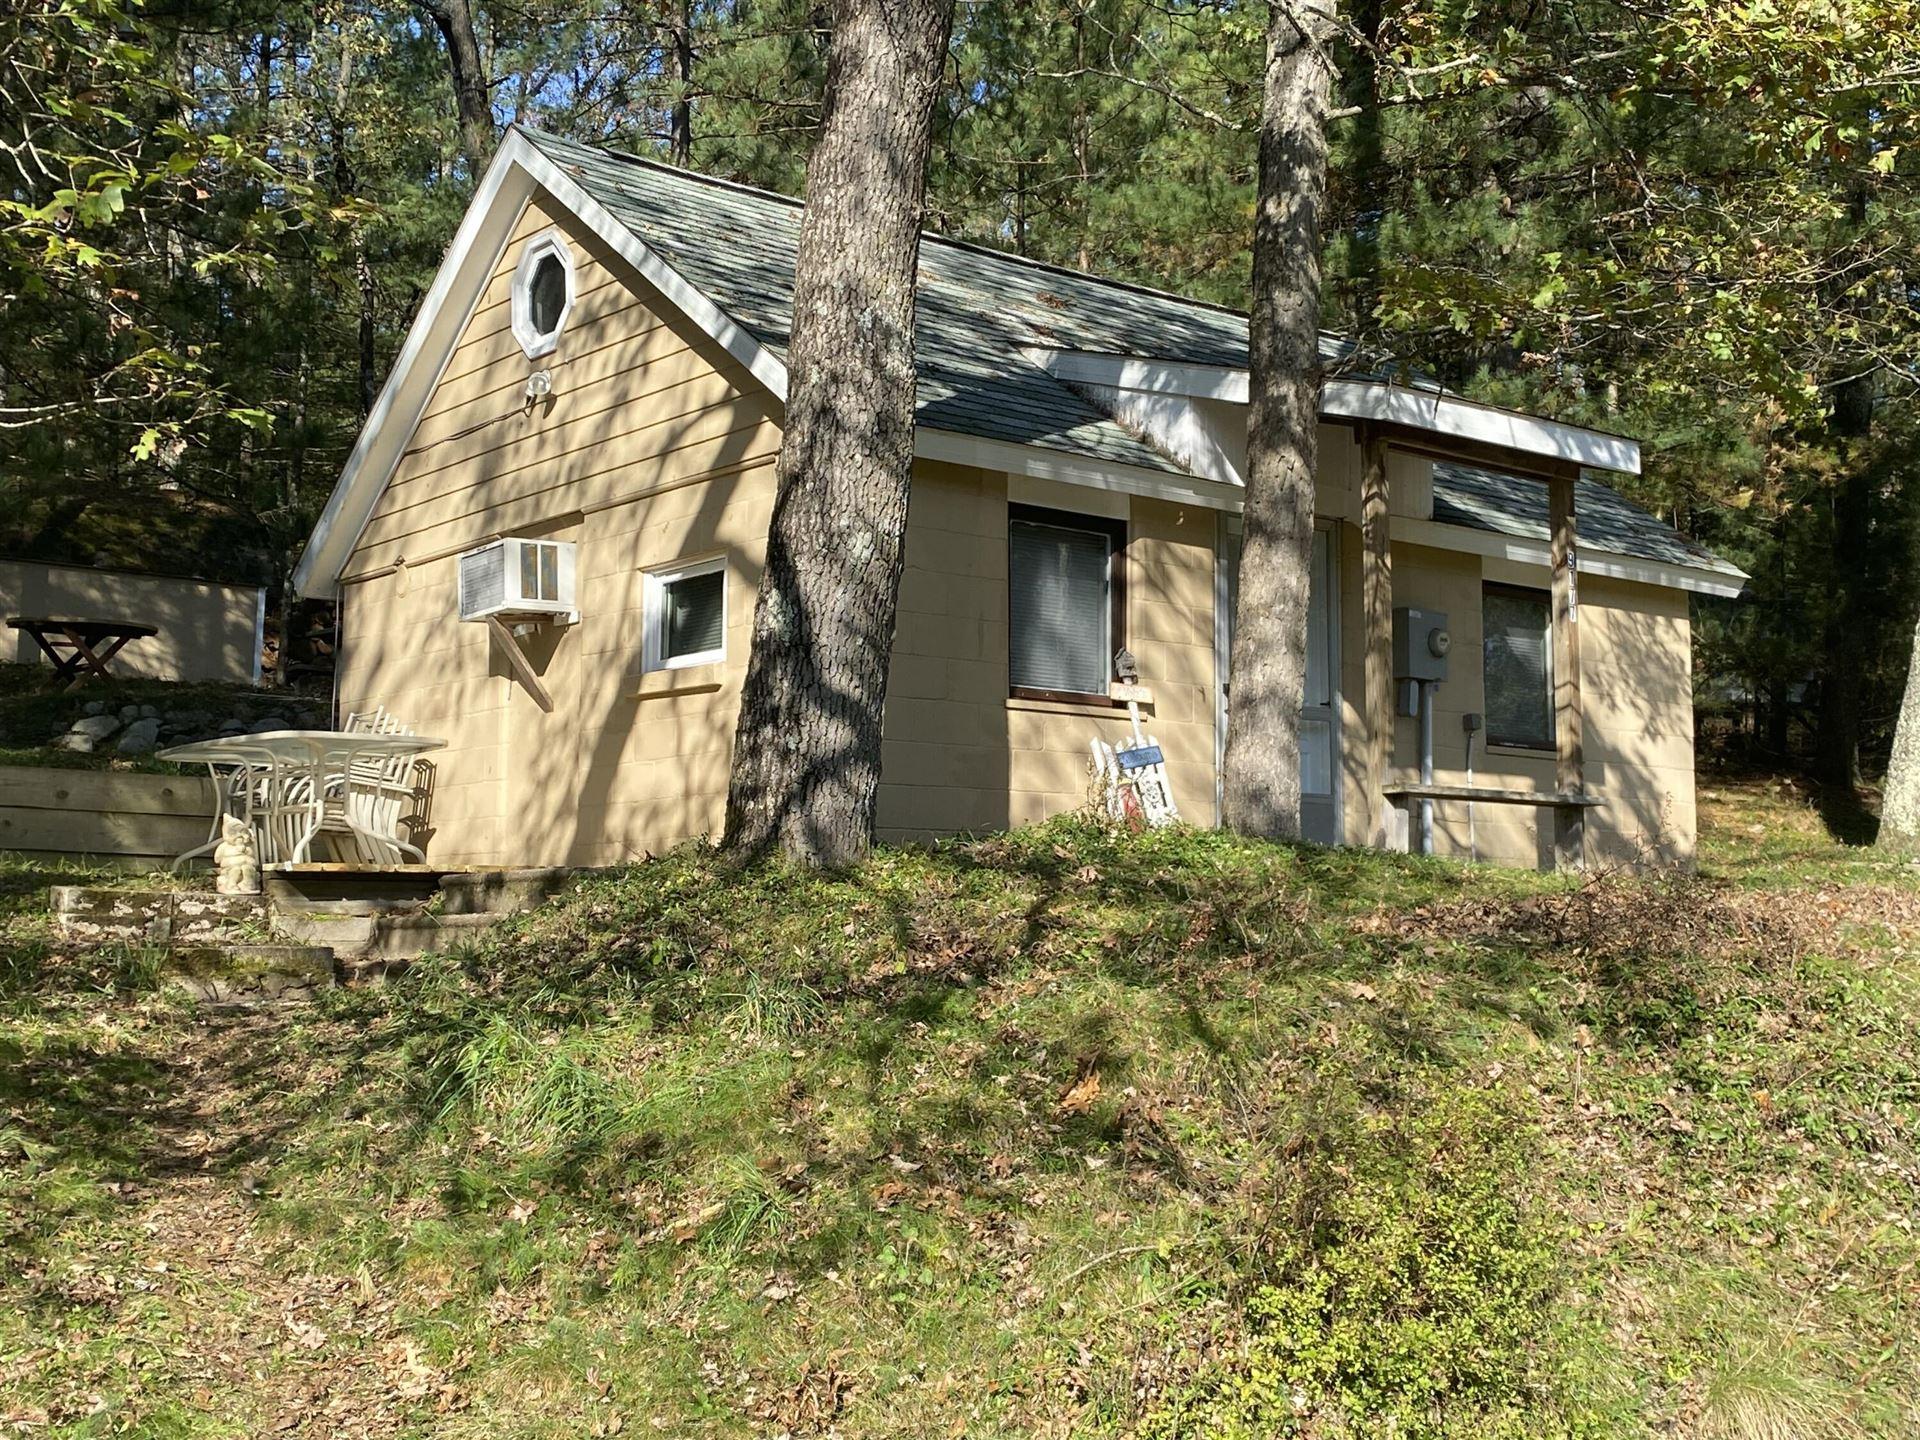 9177 S Lost Pine, Baldwin, MI 49304 - MLS#: 21112088